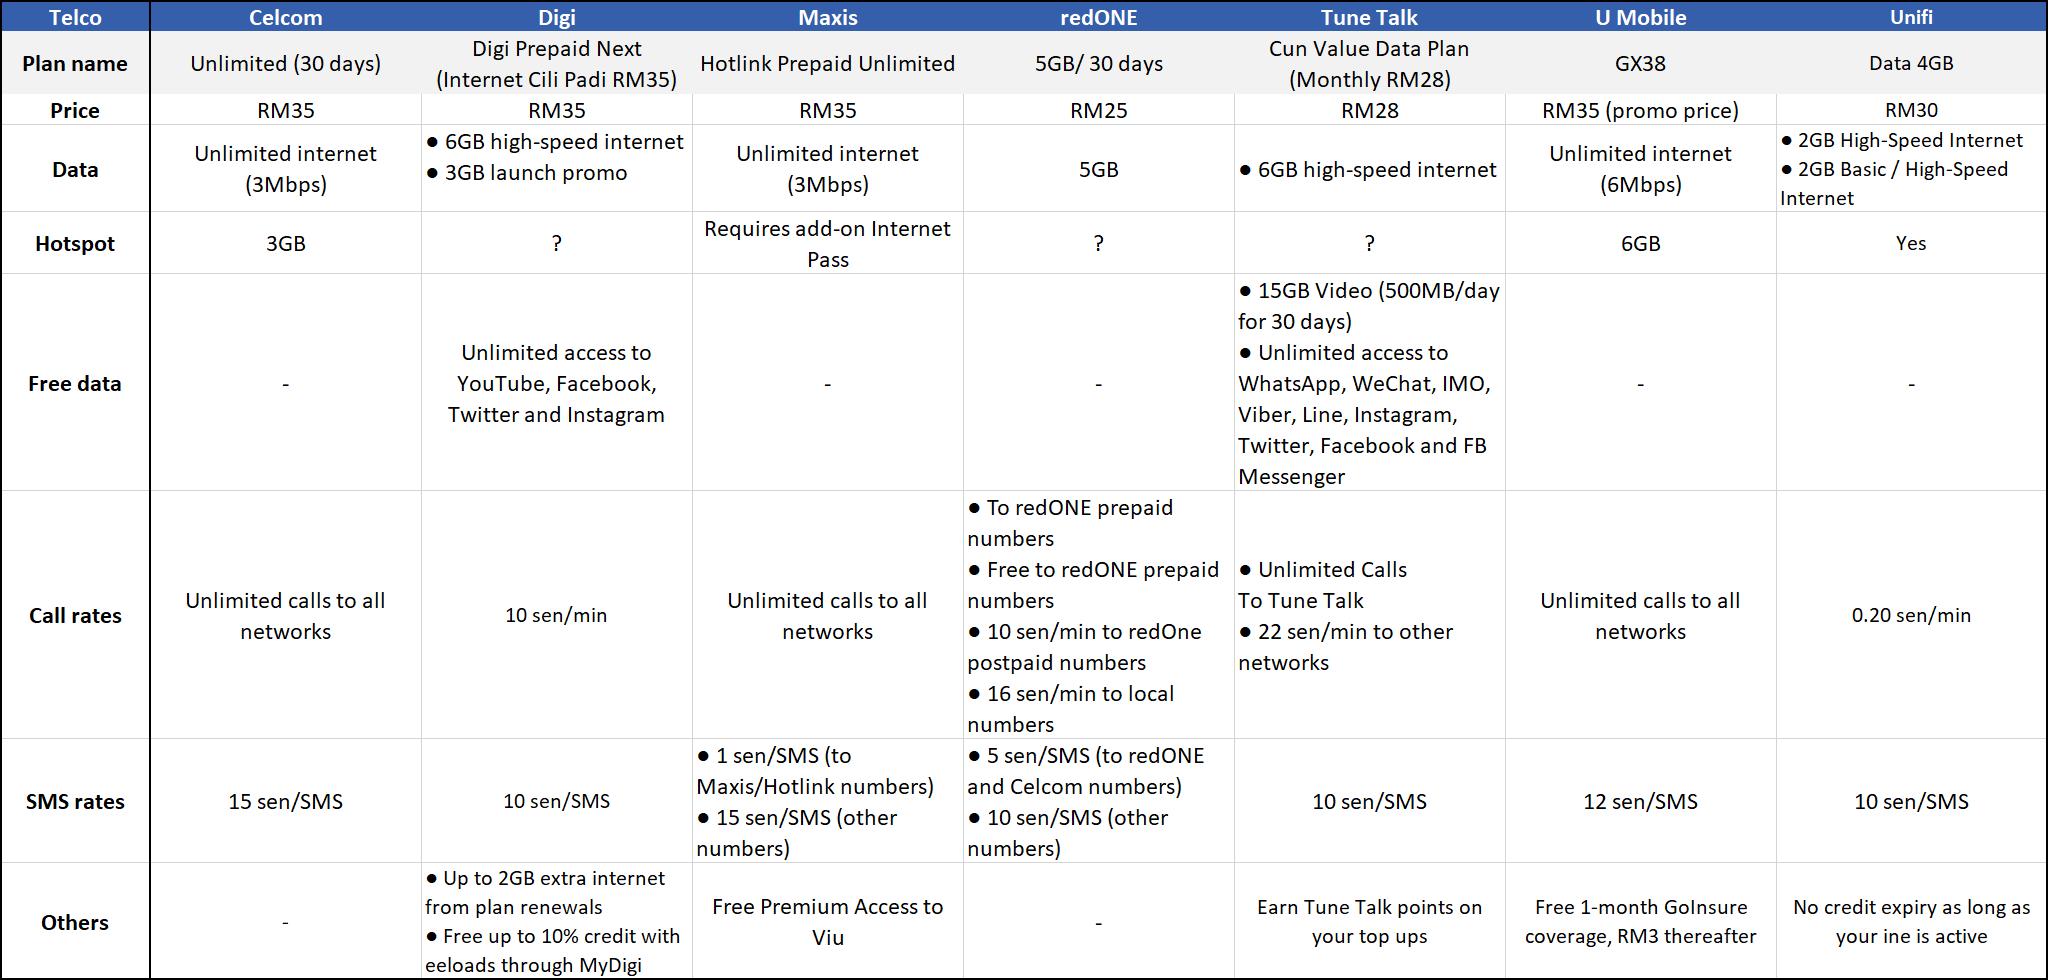 Comparison of prepaid mobile plans in Malaysia